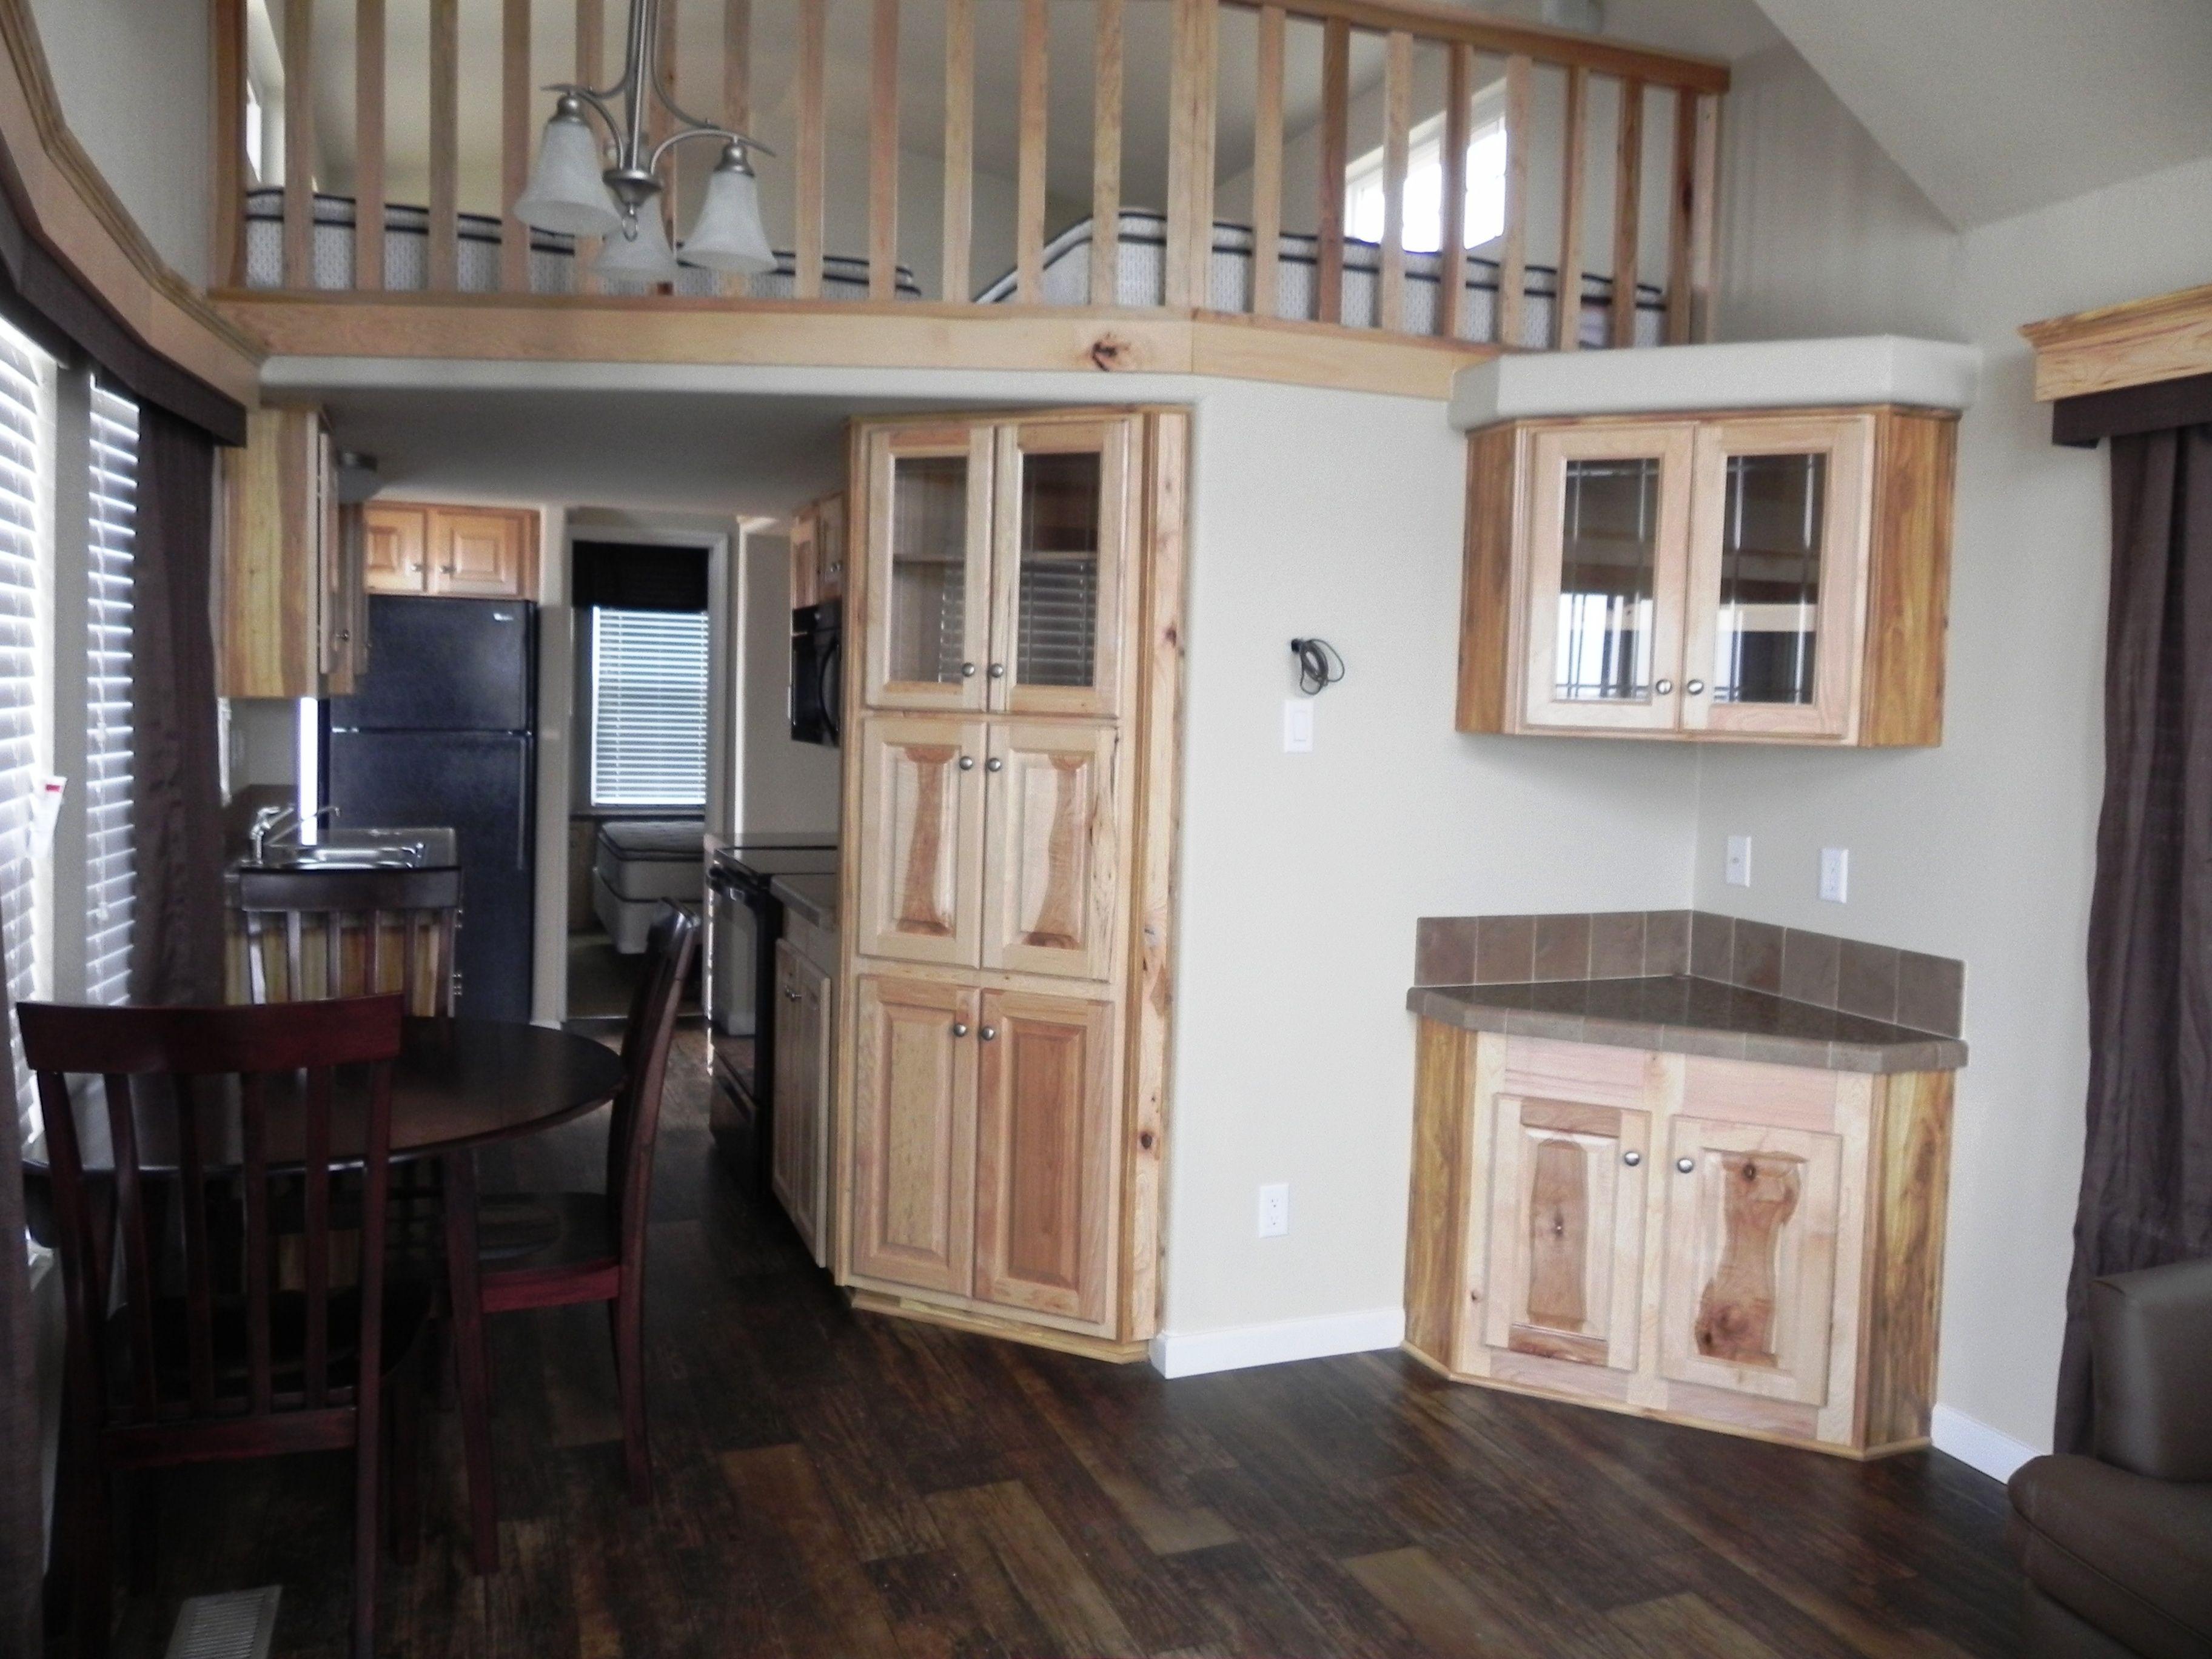 Spacious Lake Fork cabin interiors at Pope's Landing Marina! www.Popeslanding.com